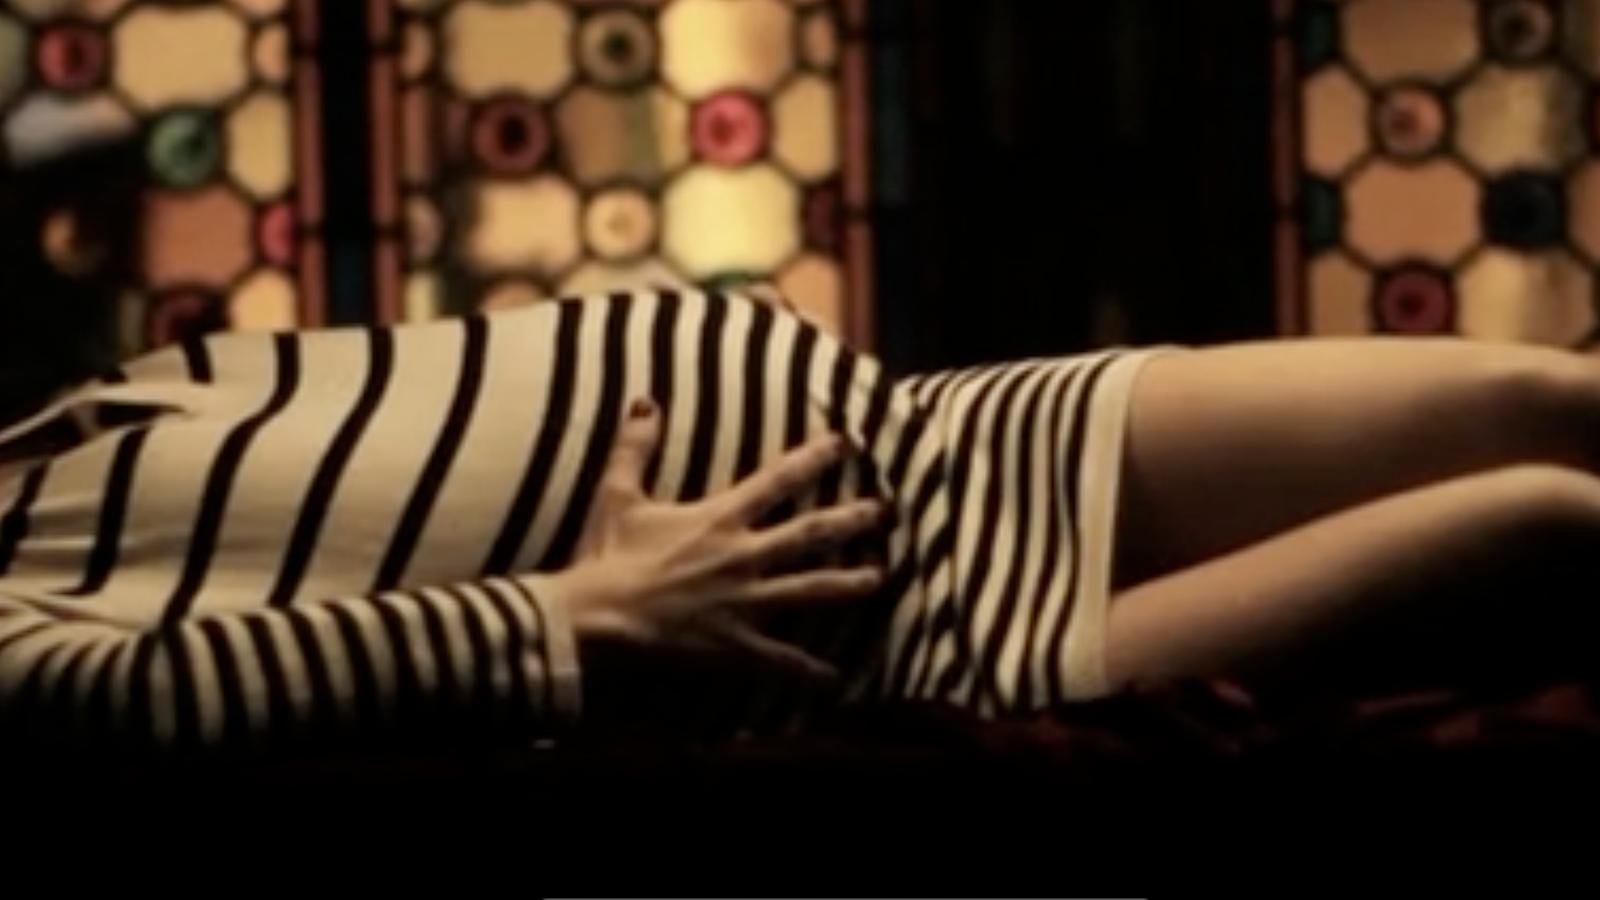 El Montseny satànic, en el nou videoclip dels Surfing Sirles